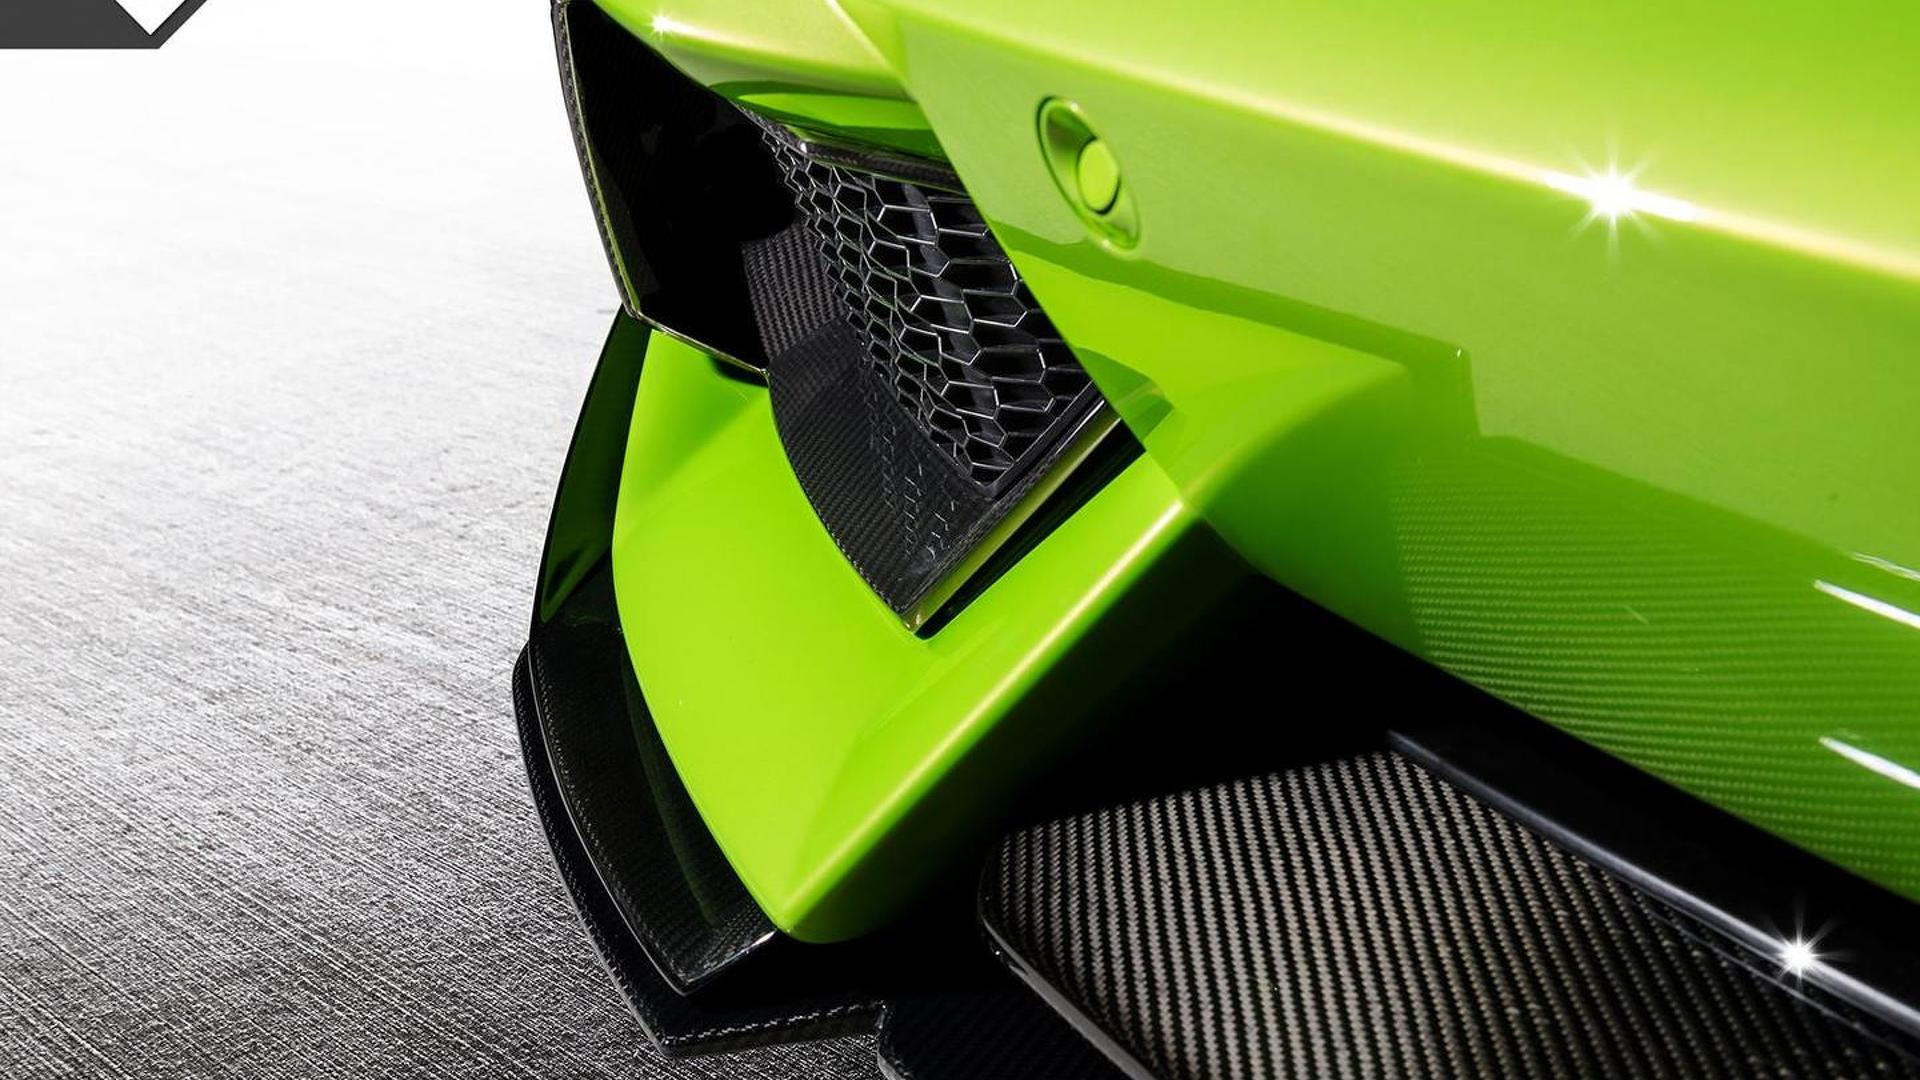 Апгрейд Lamborghini Aventador-V Roadster The Hulk от Vorsteiner